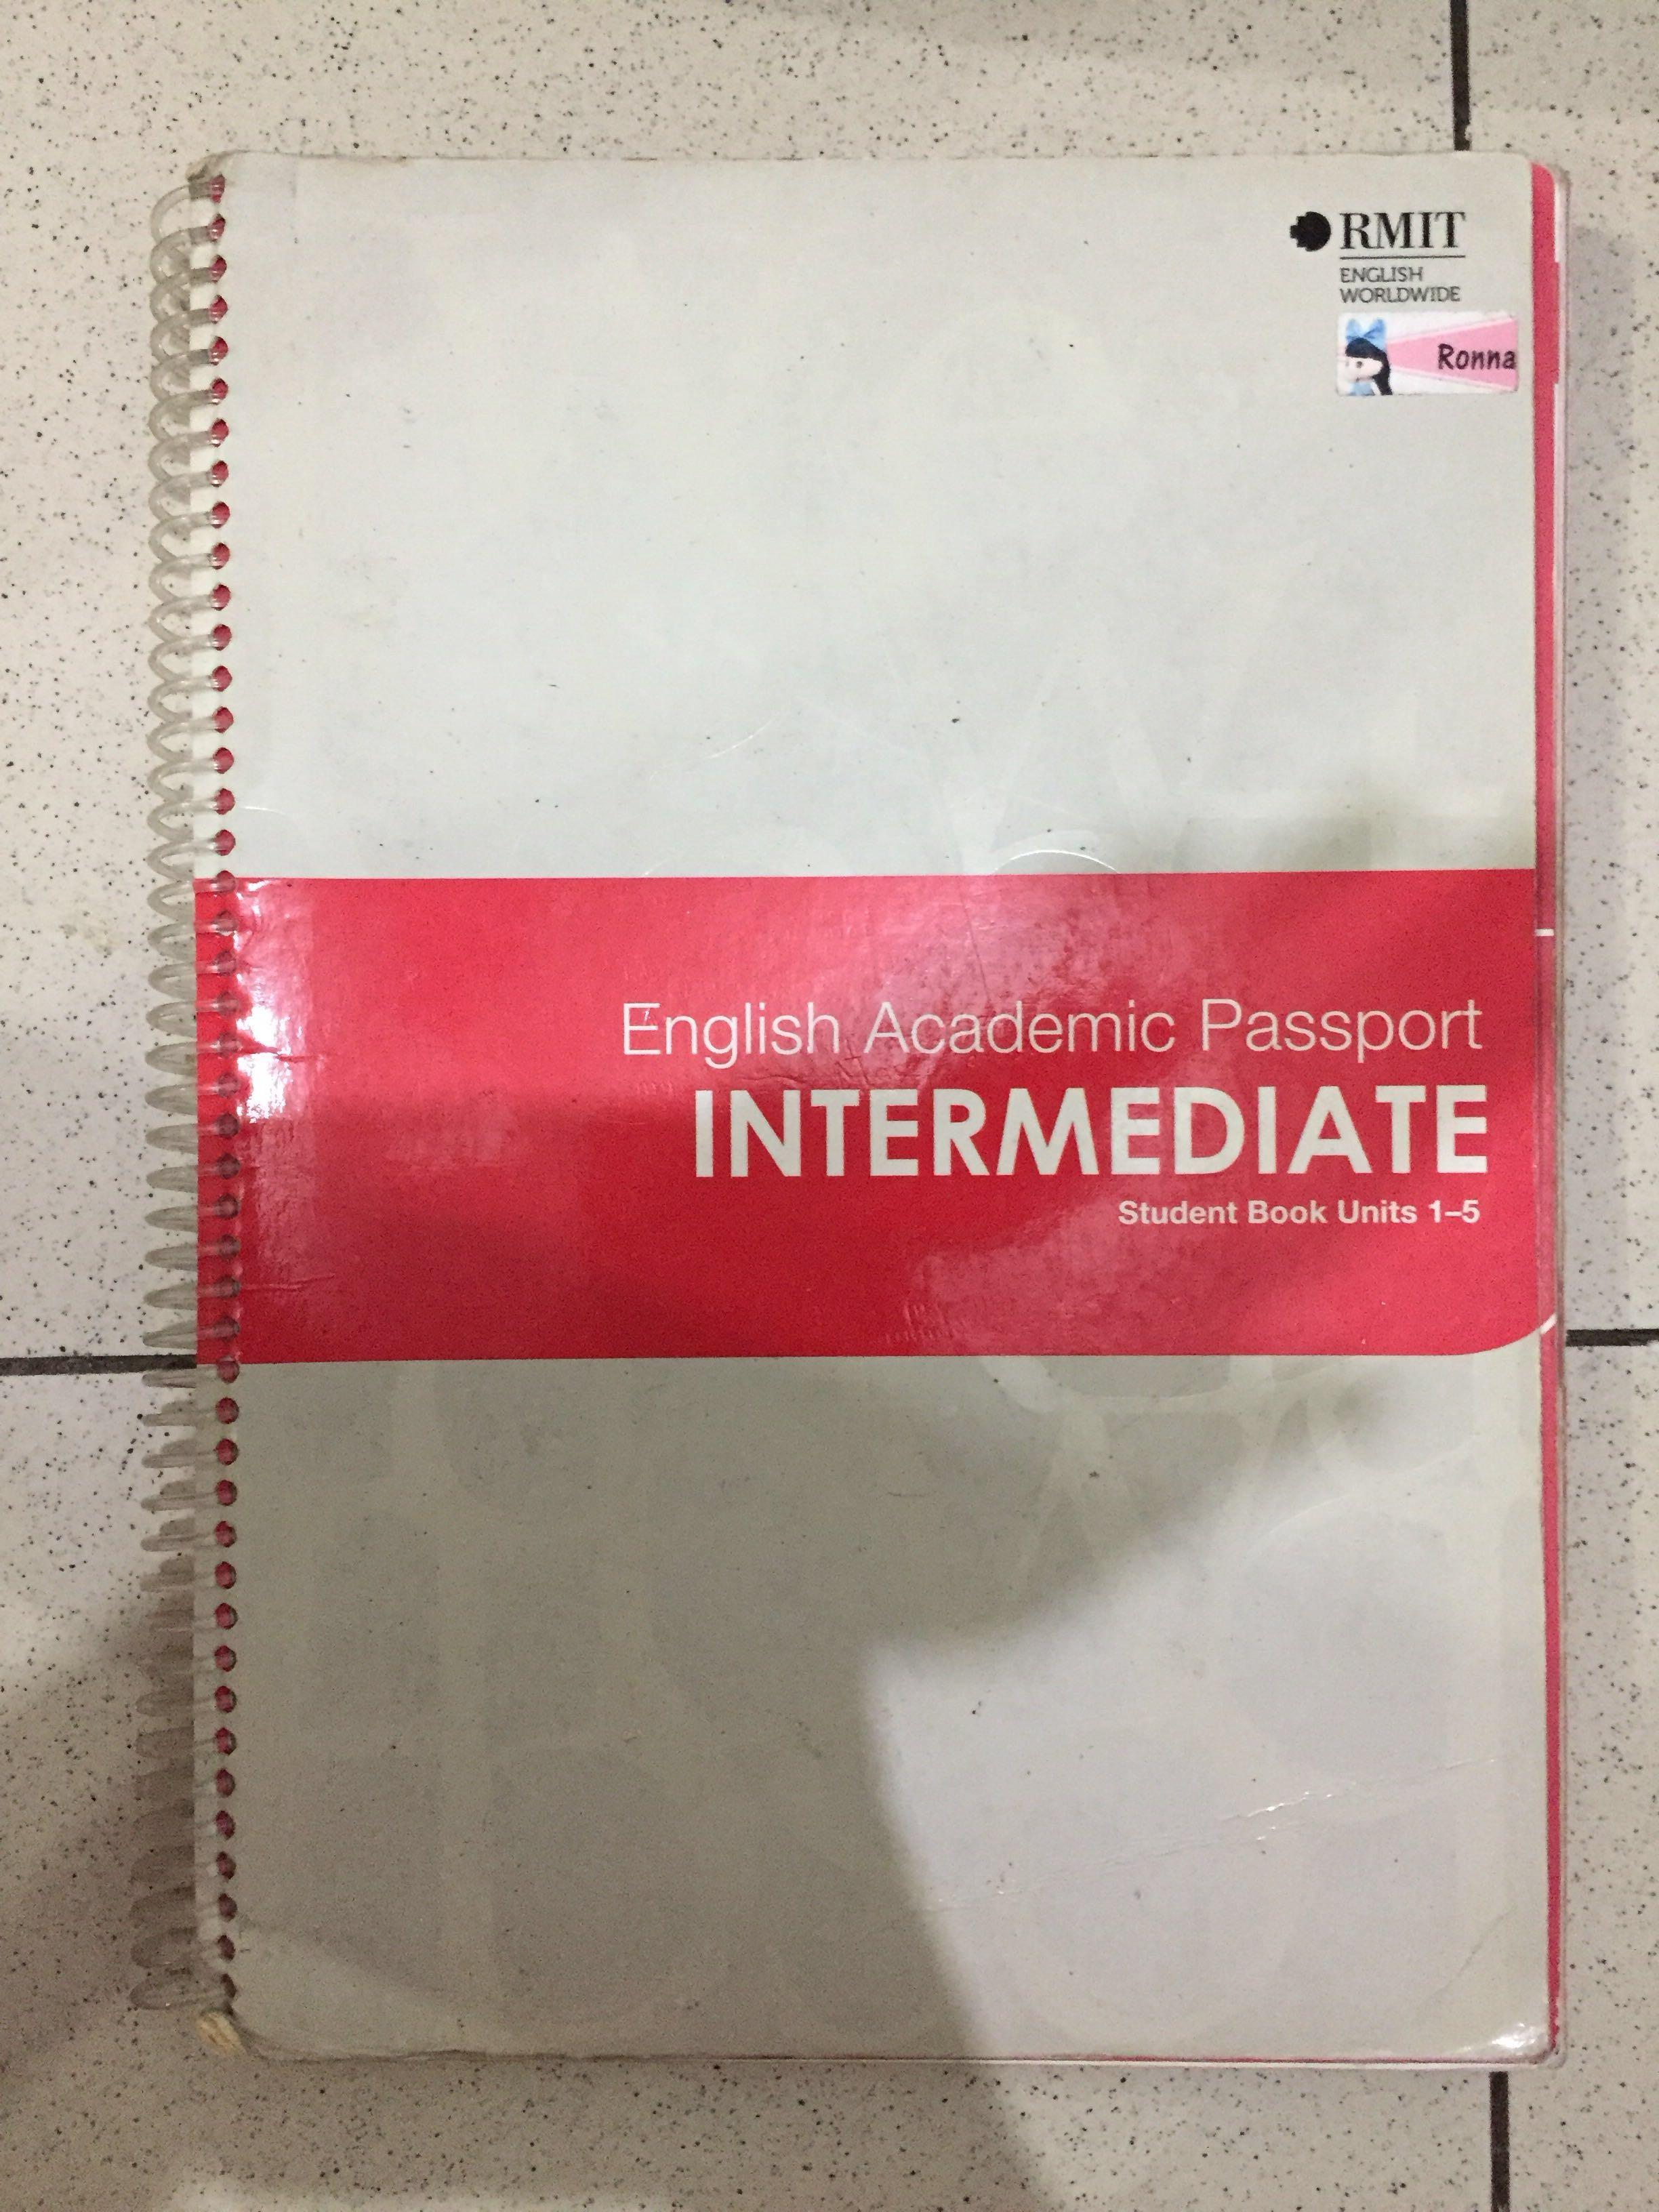 Buku Bahasa Inggris RMIT Training English Worldwide Student Book English Grammar Toefl Ielts Academic Passport